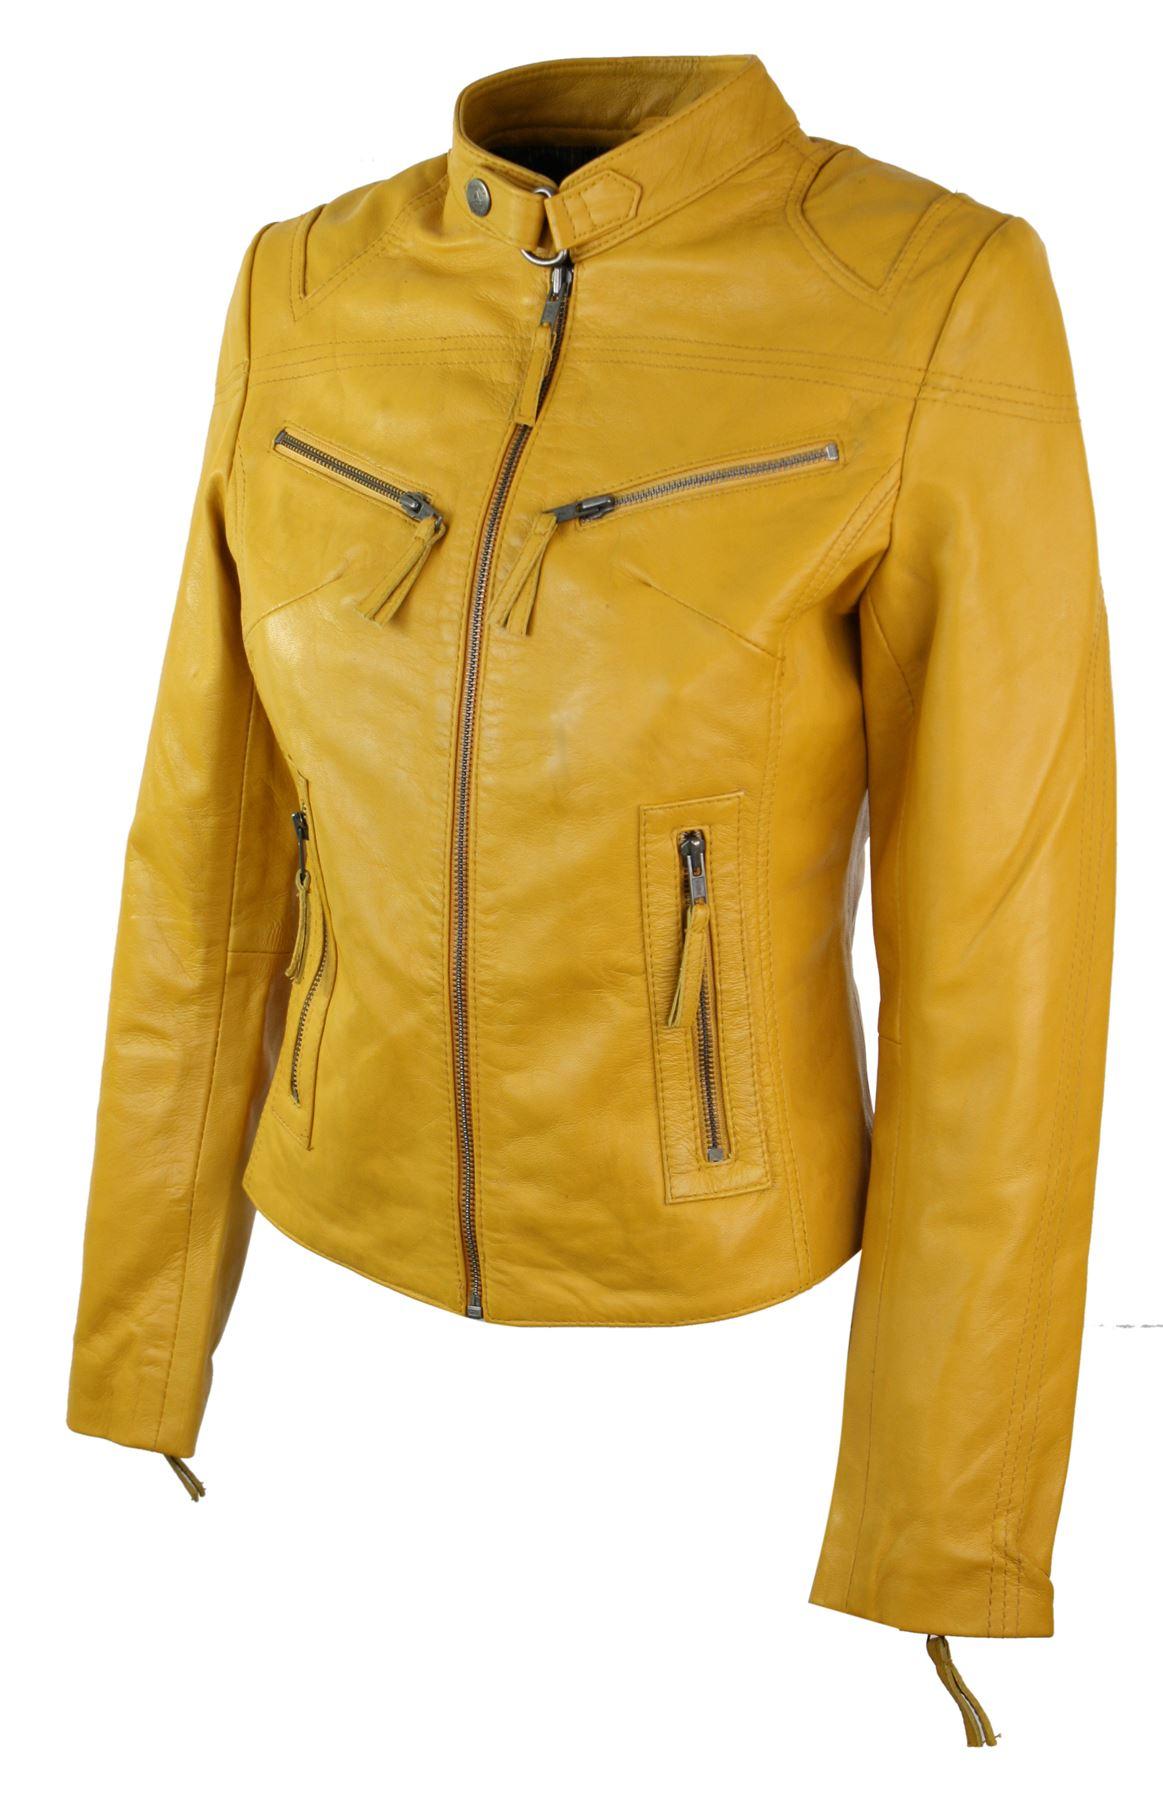 7e954b671ffe Perfecto femme cuir véritable style biker vintage coupe cintrée   eBay